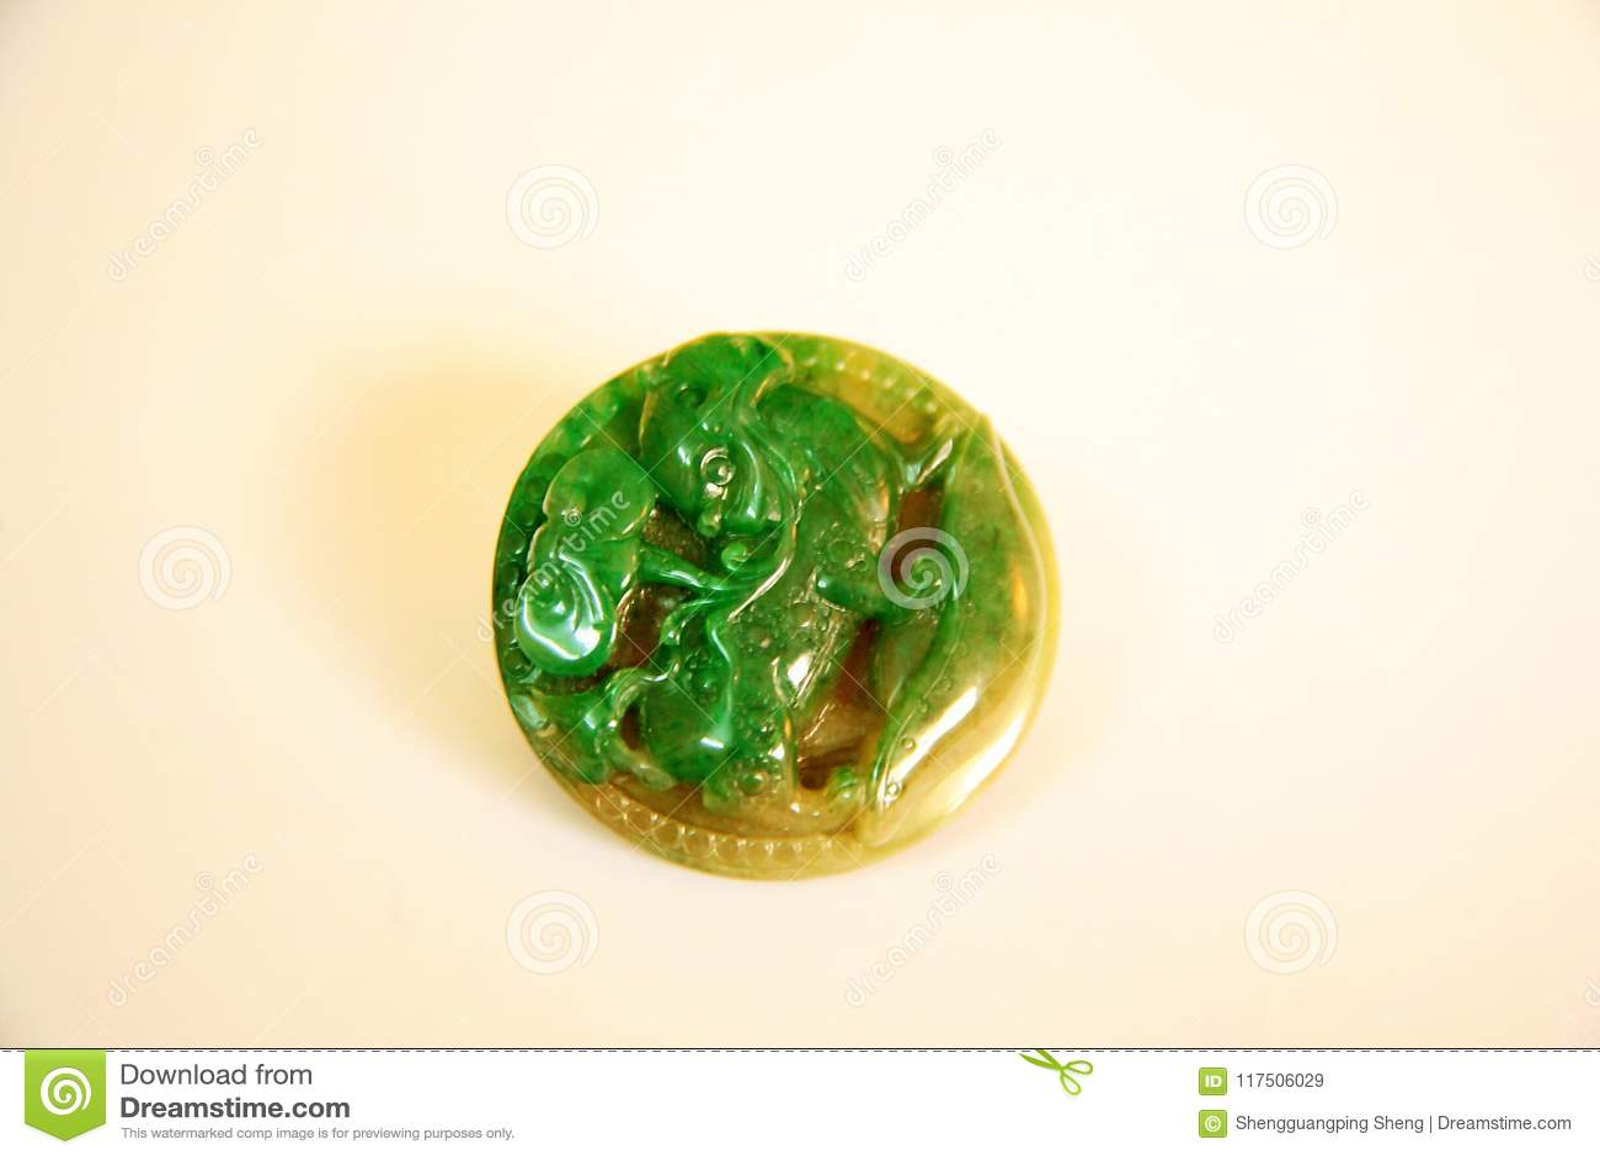 Jade carving: MyD wild animal